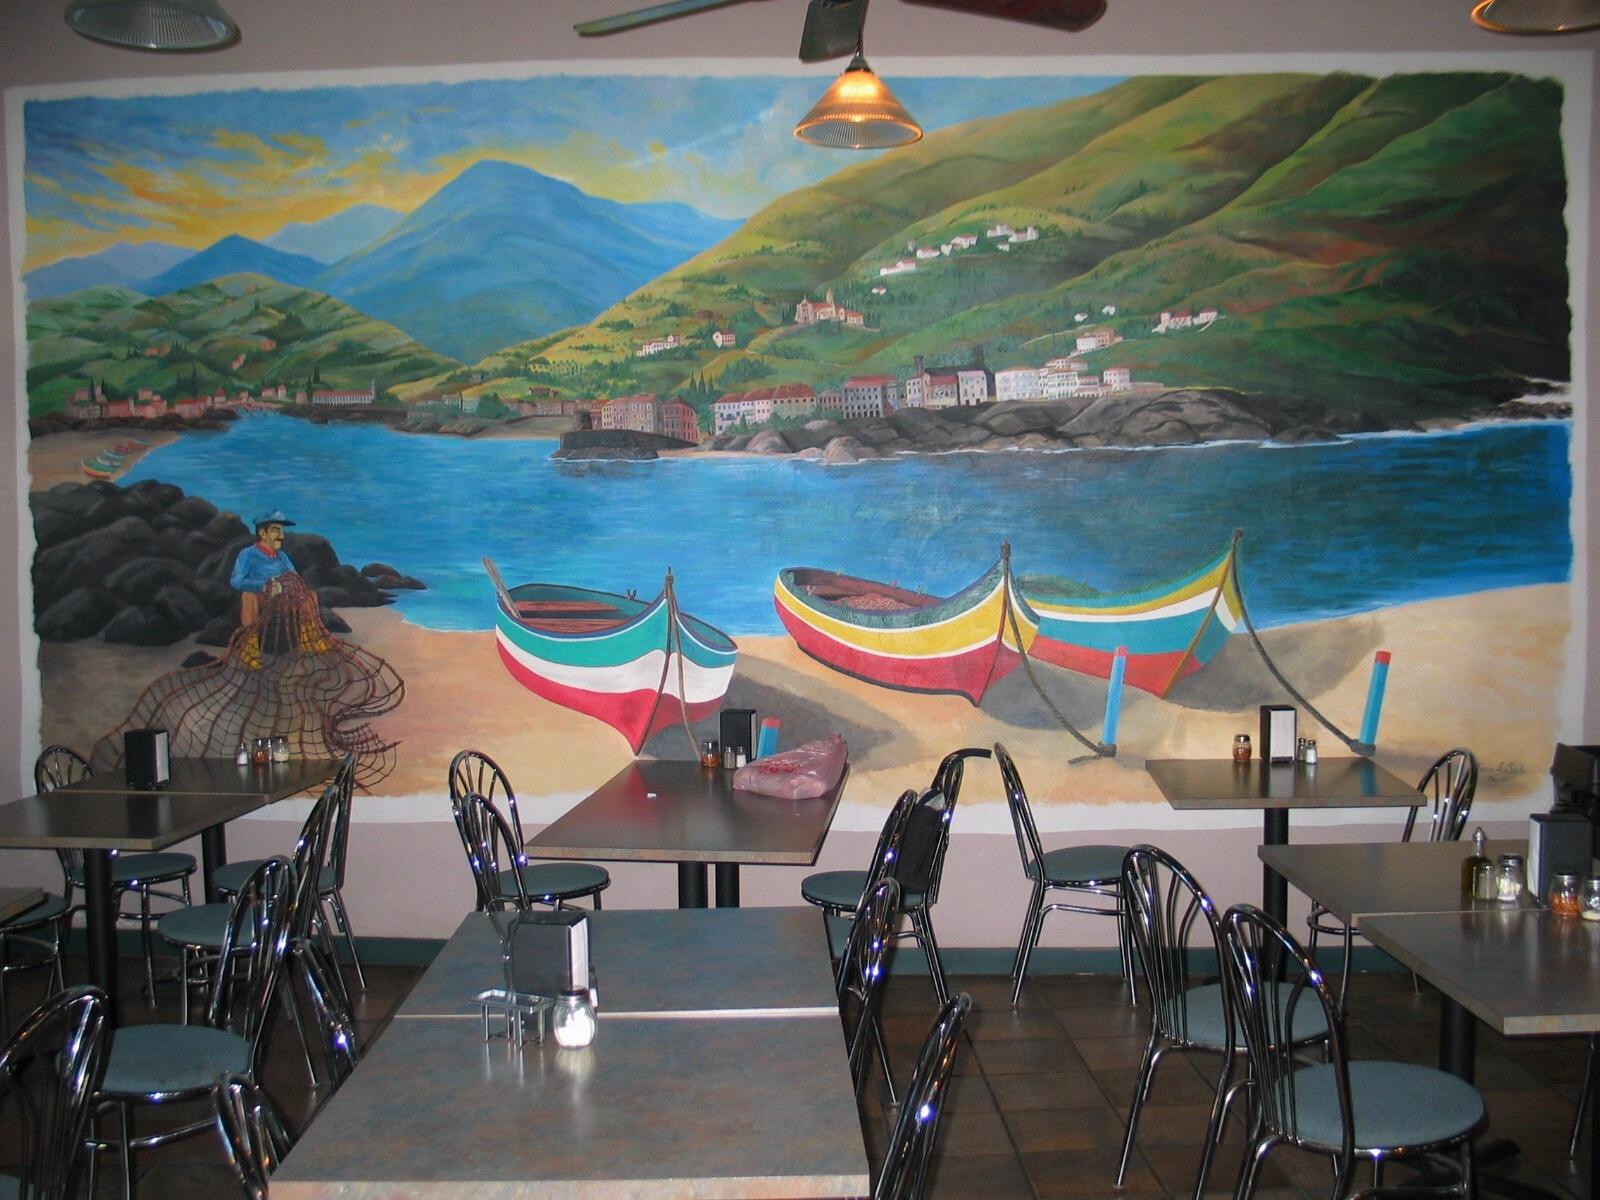 Portabella Restaurant Mural